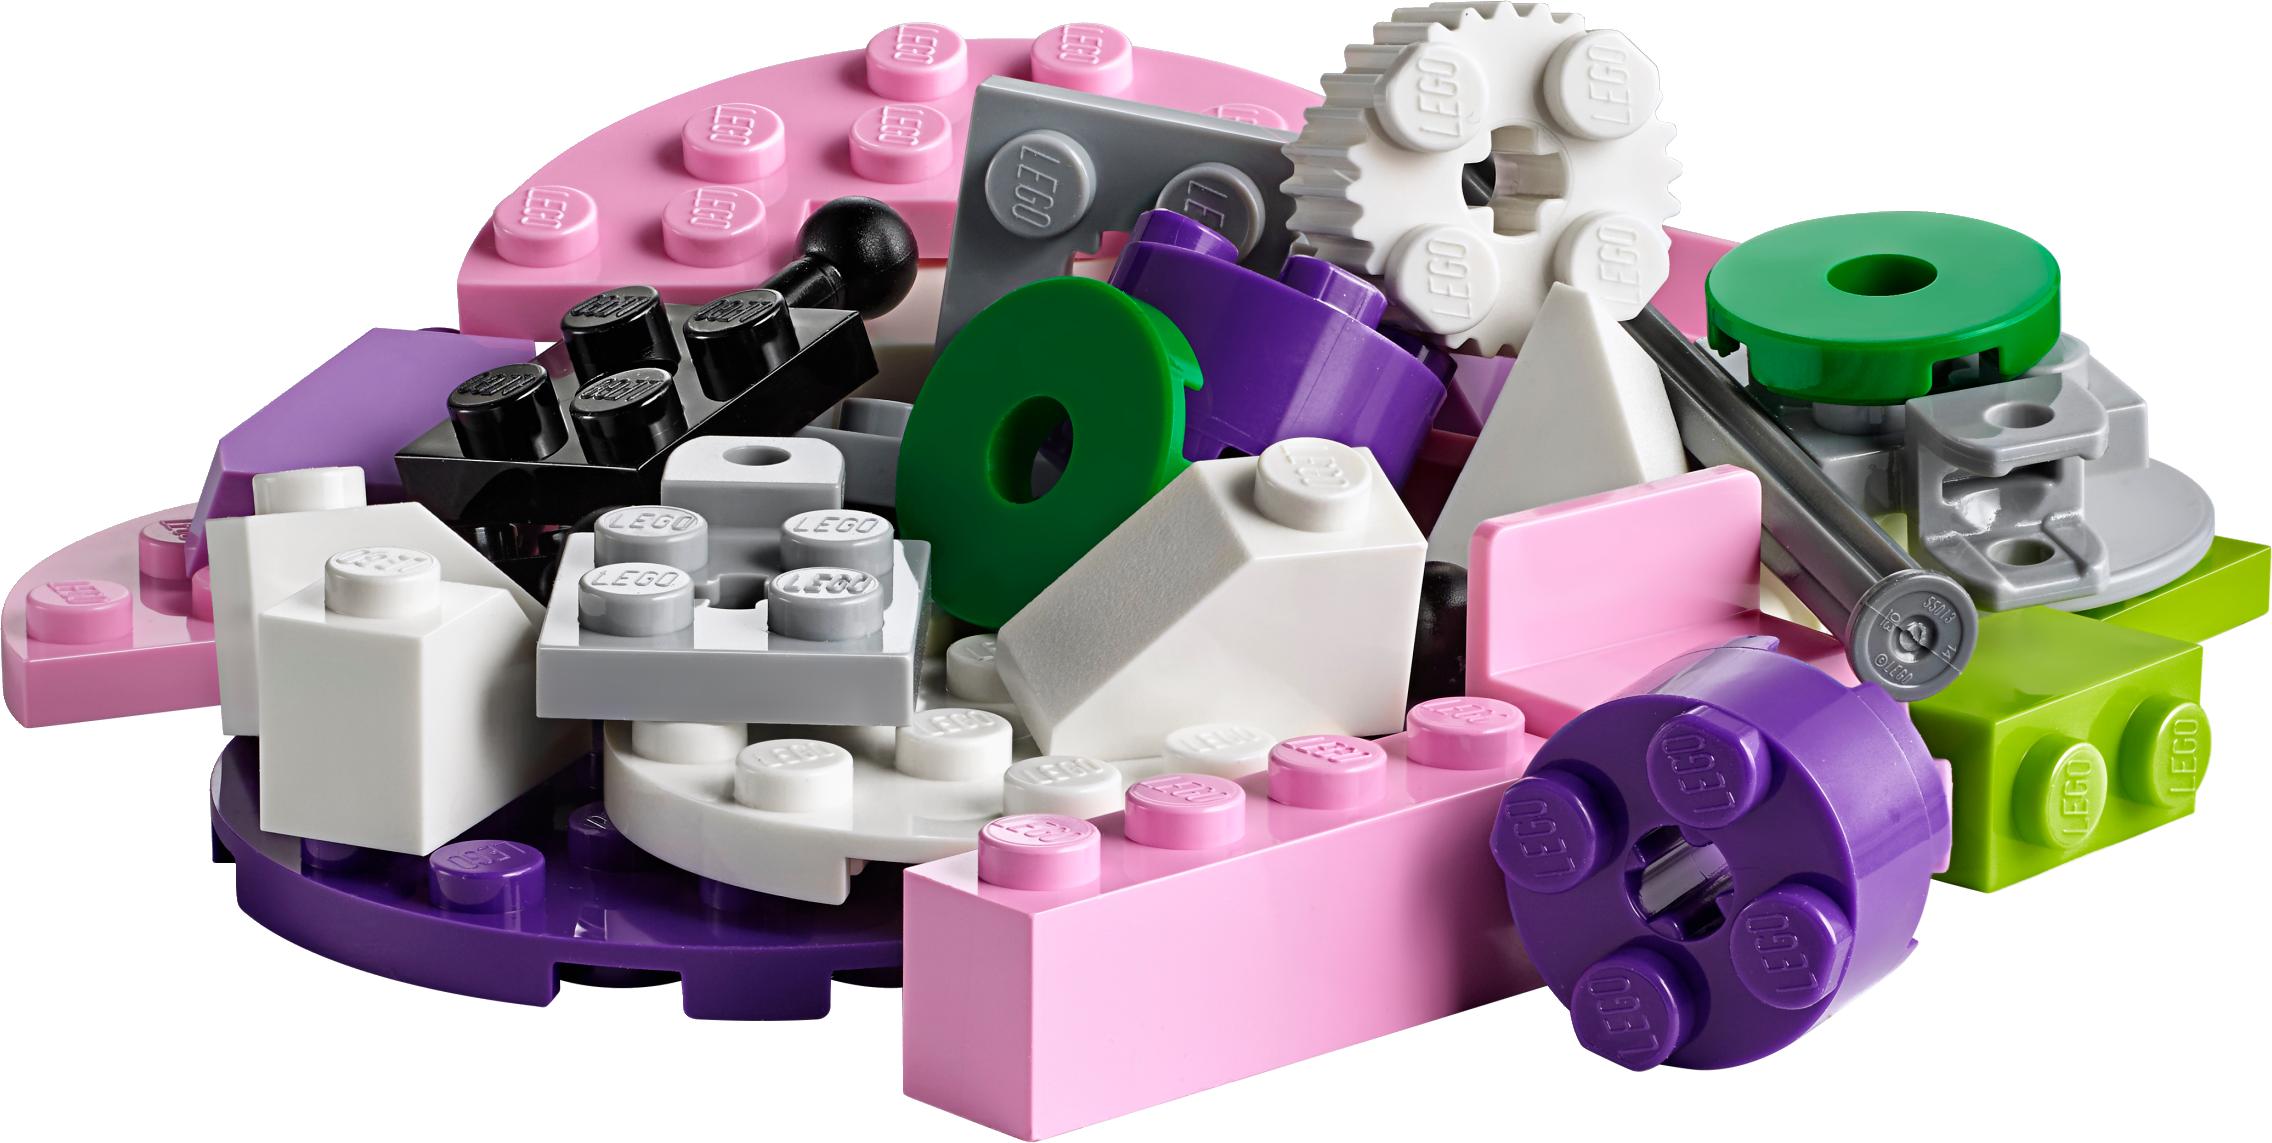 Bricks and Gears